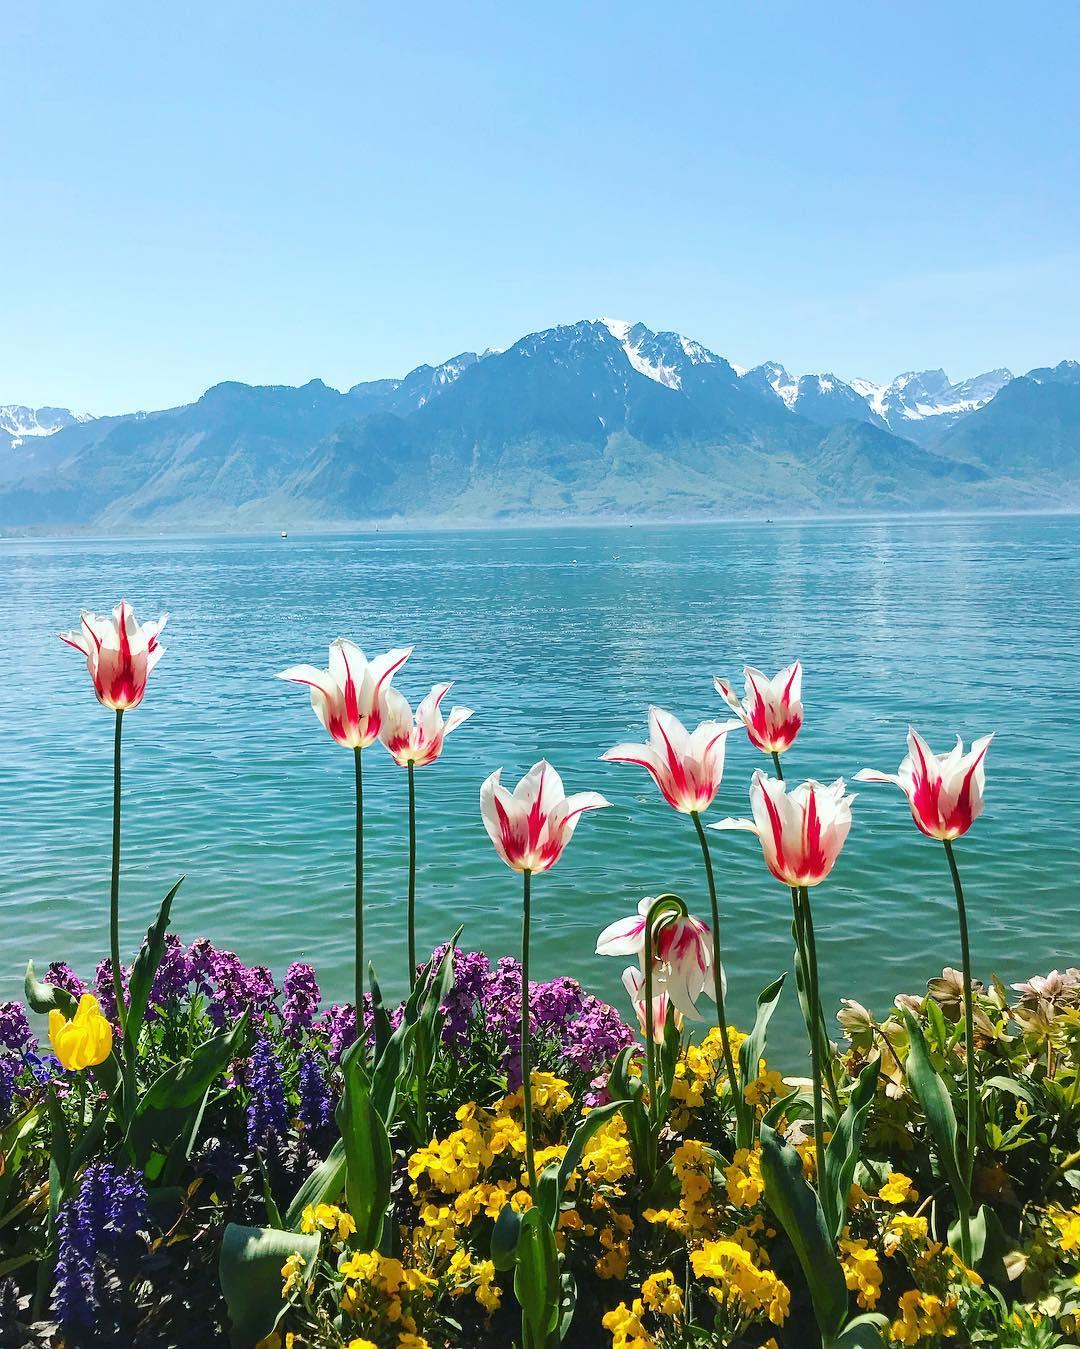 Montreux spring